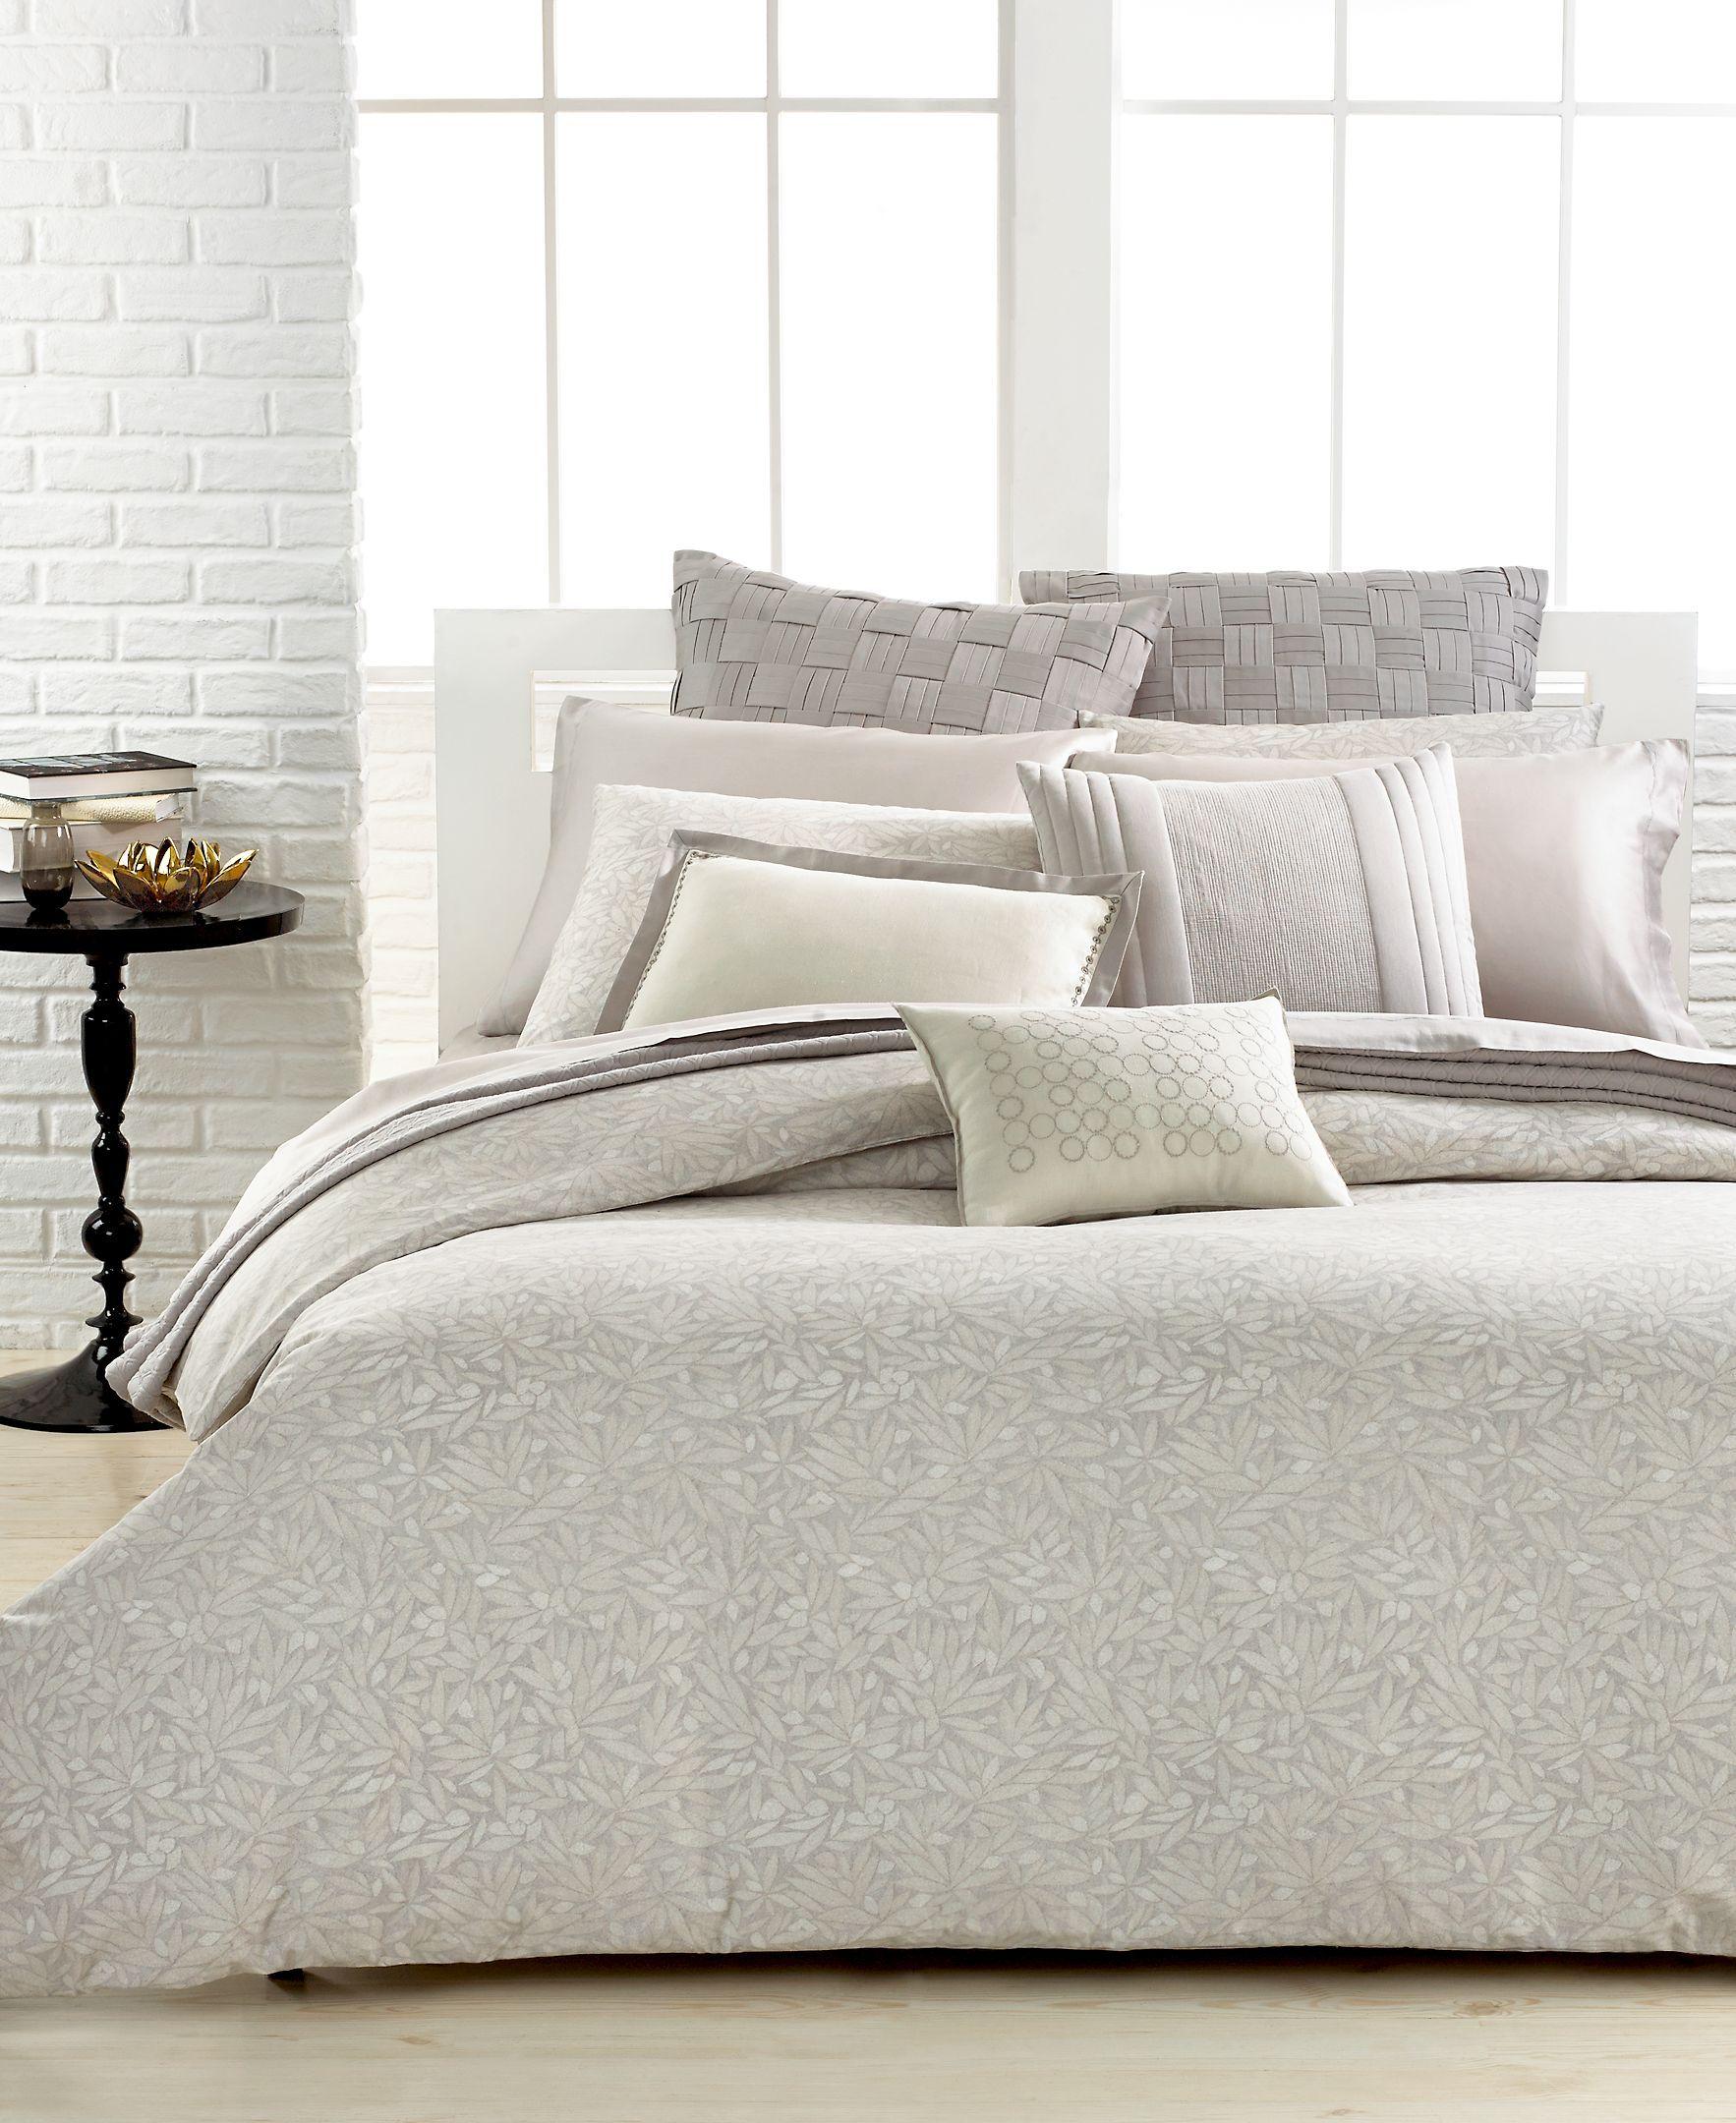 Vera Wang Bamboo Leaves 20 Square Decorative Pillow King Duvet